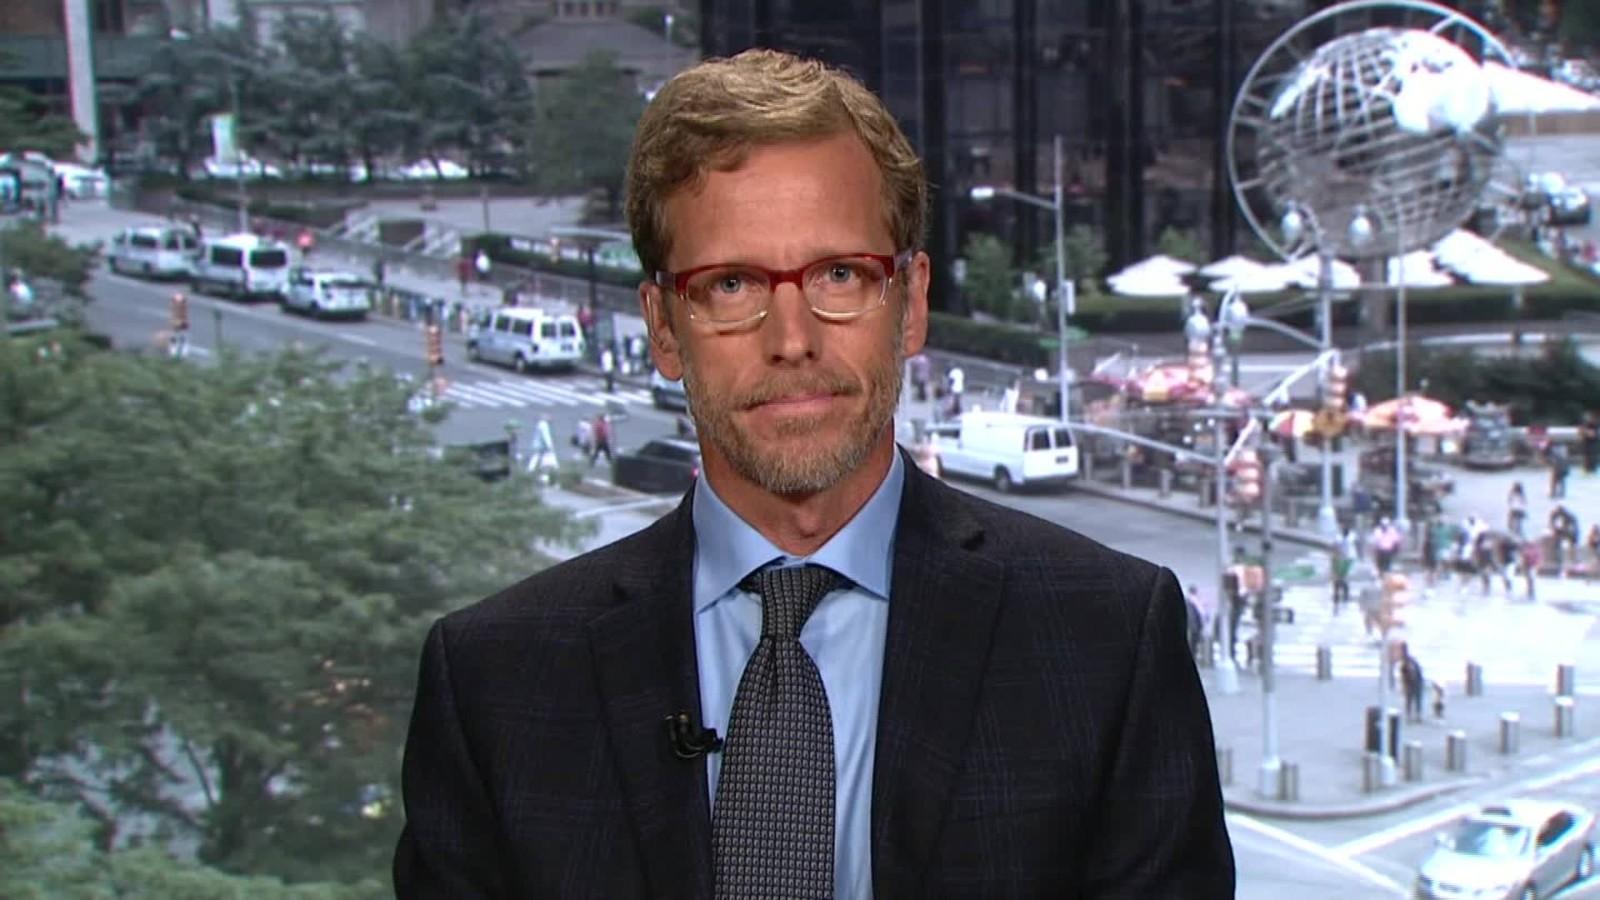 Interior Dept climate change whistleblower resigns   CNNPolitics